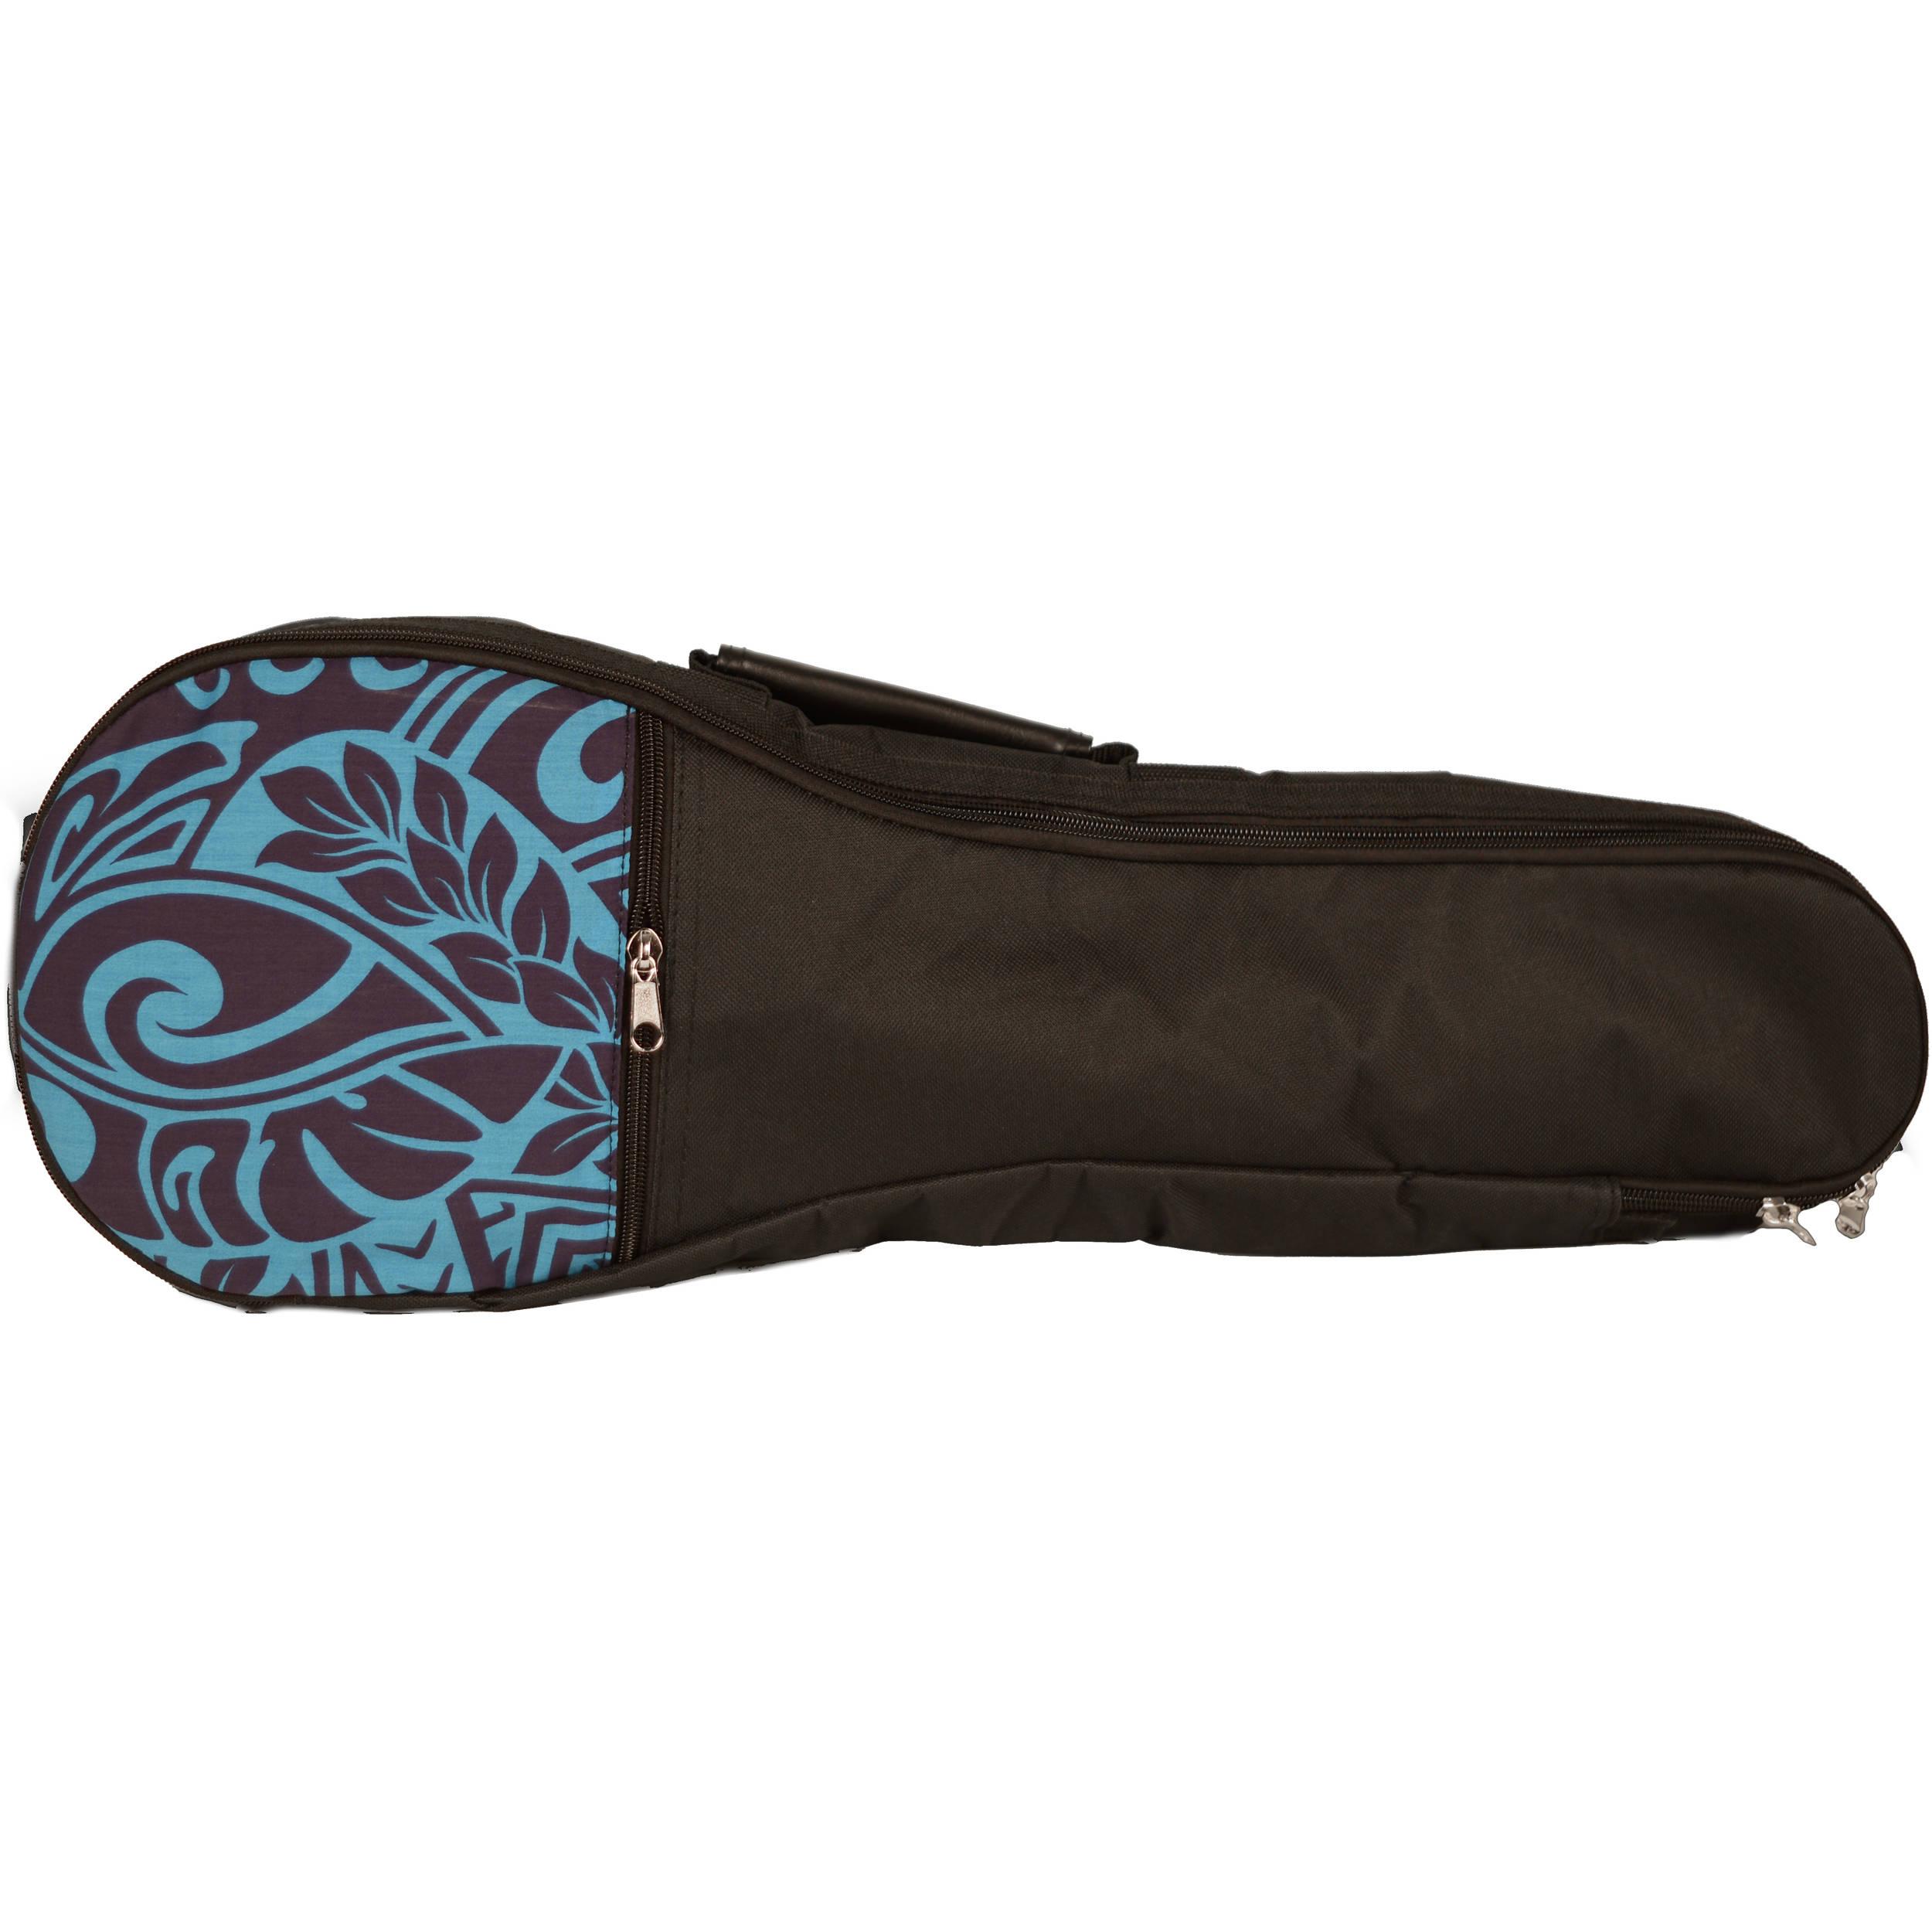 KALA Hawaiian Accent Padded Bag for Concert Ukulele UB-BL-C B&H